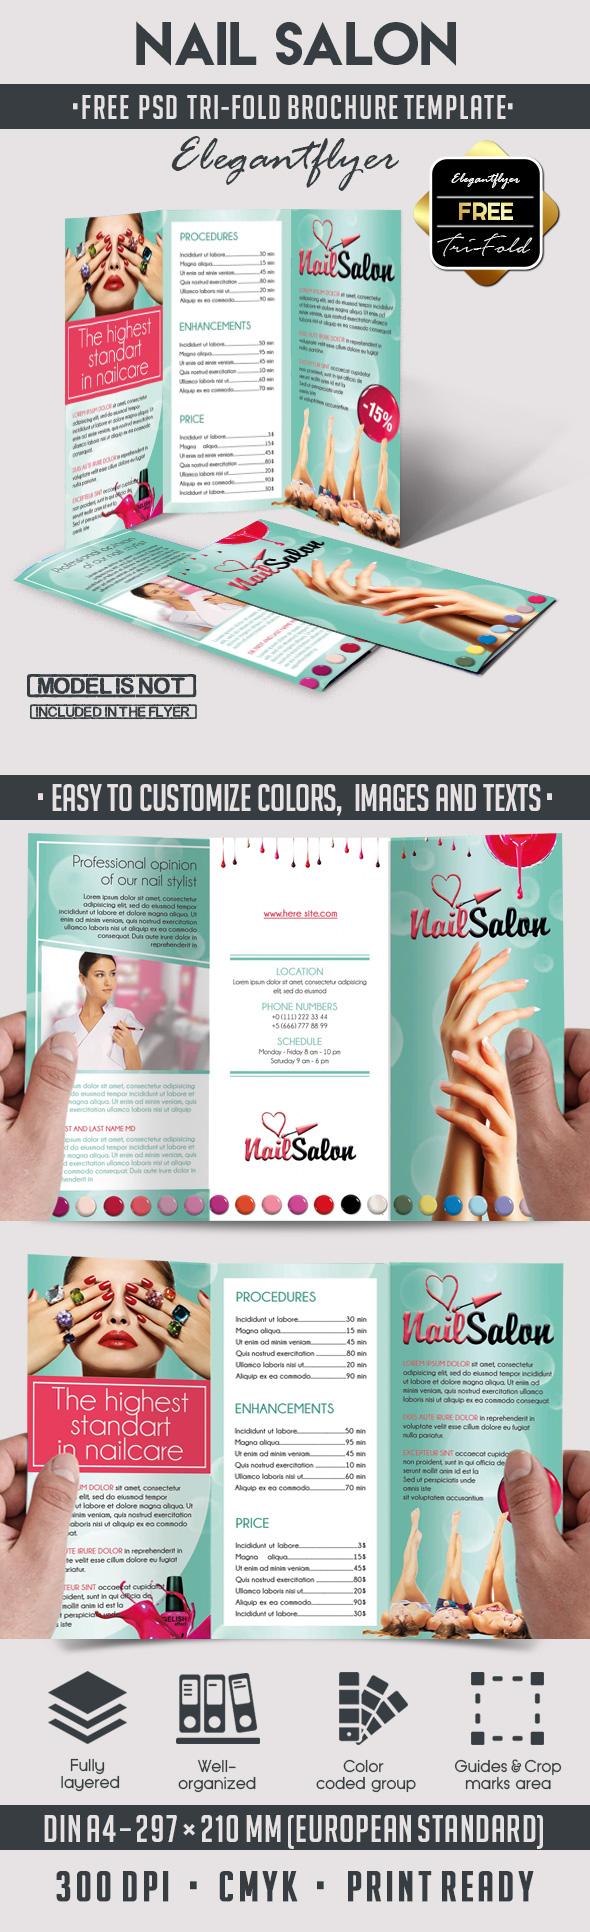 nail free tri fold psd brochure template httpswwwelegantflyer